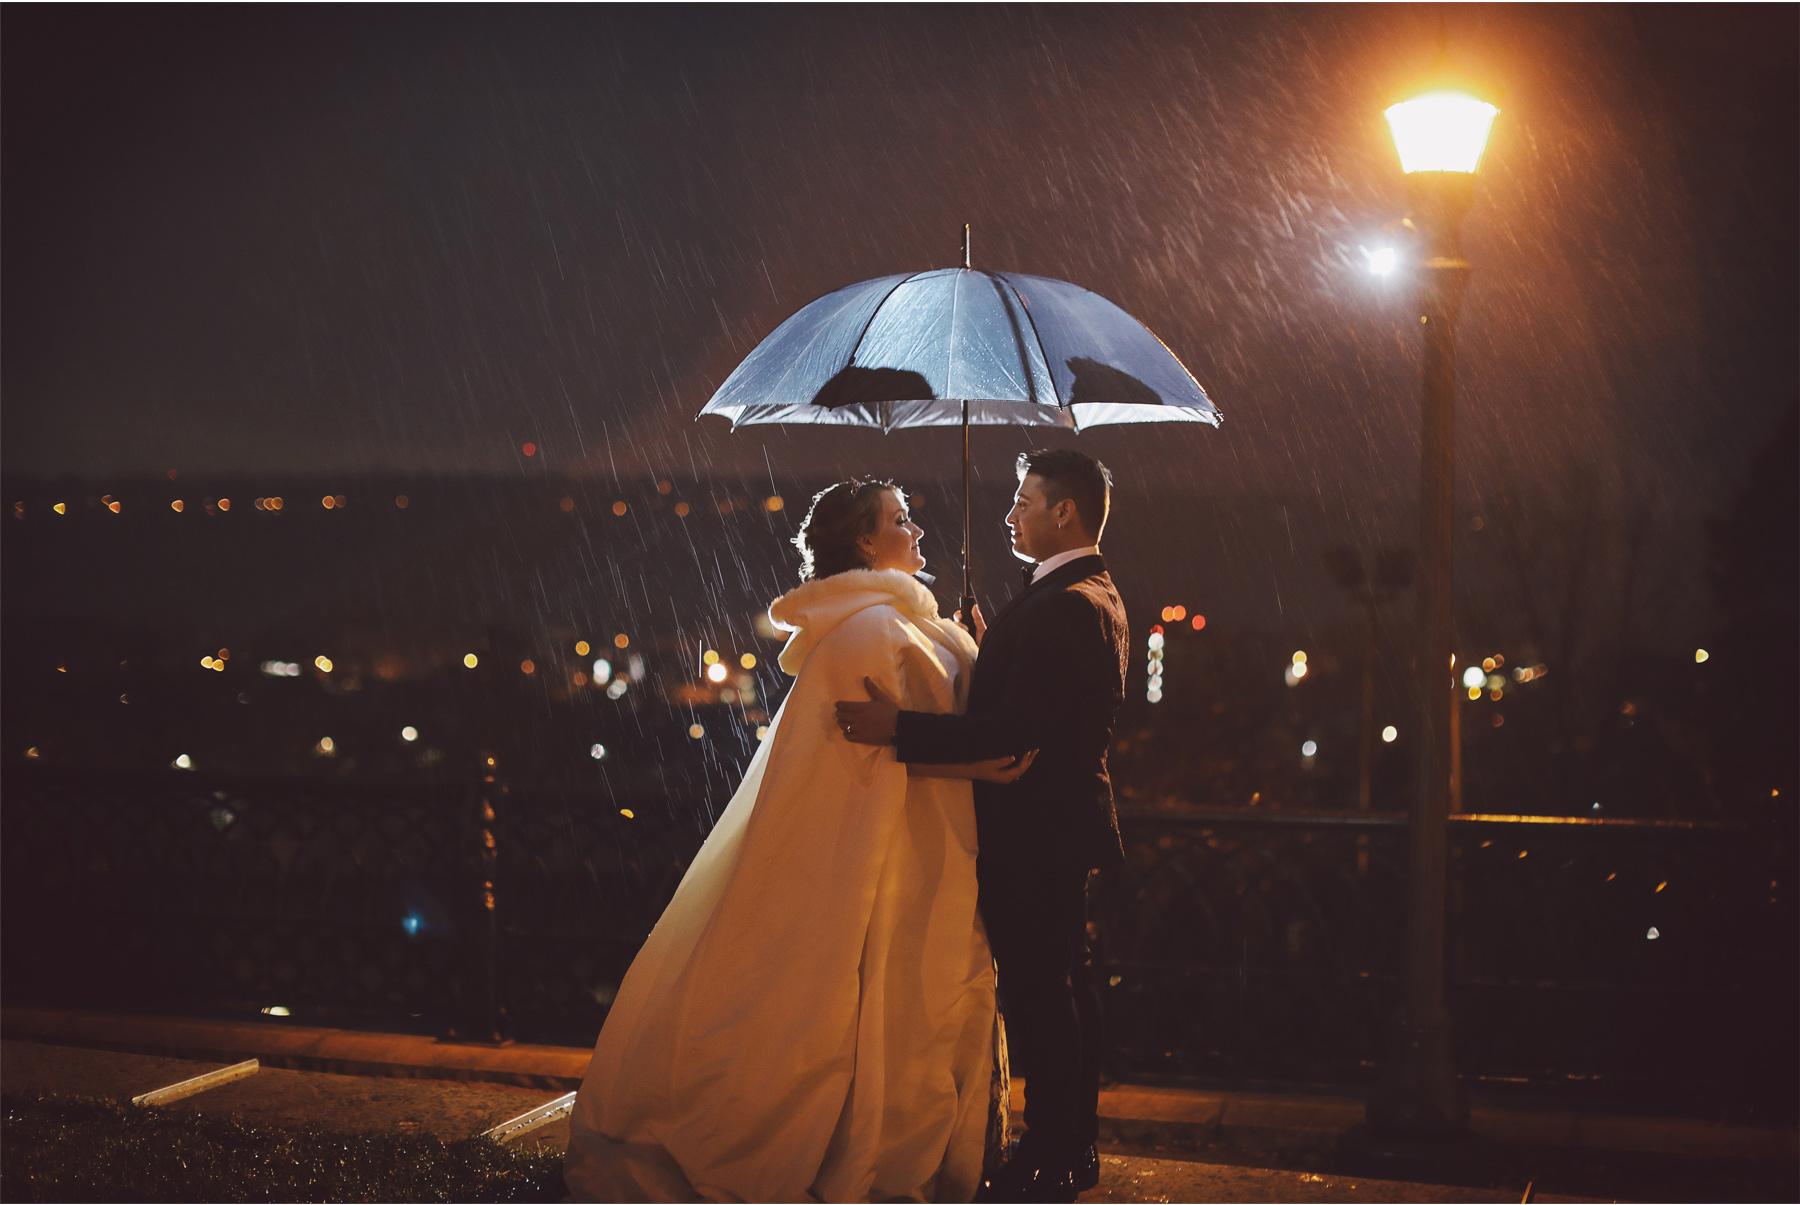 13-Saint-Paul-Minnesota-Wedding-Photography-by-Vick-Photography-The-University-Club-Night-Photography-Rain-Umbrella-Mari-and-Giuseppe.jpg